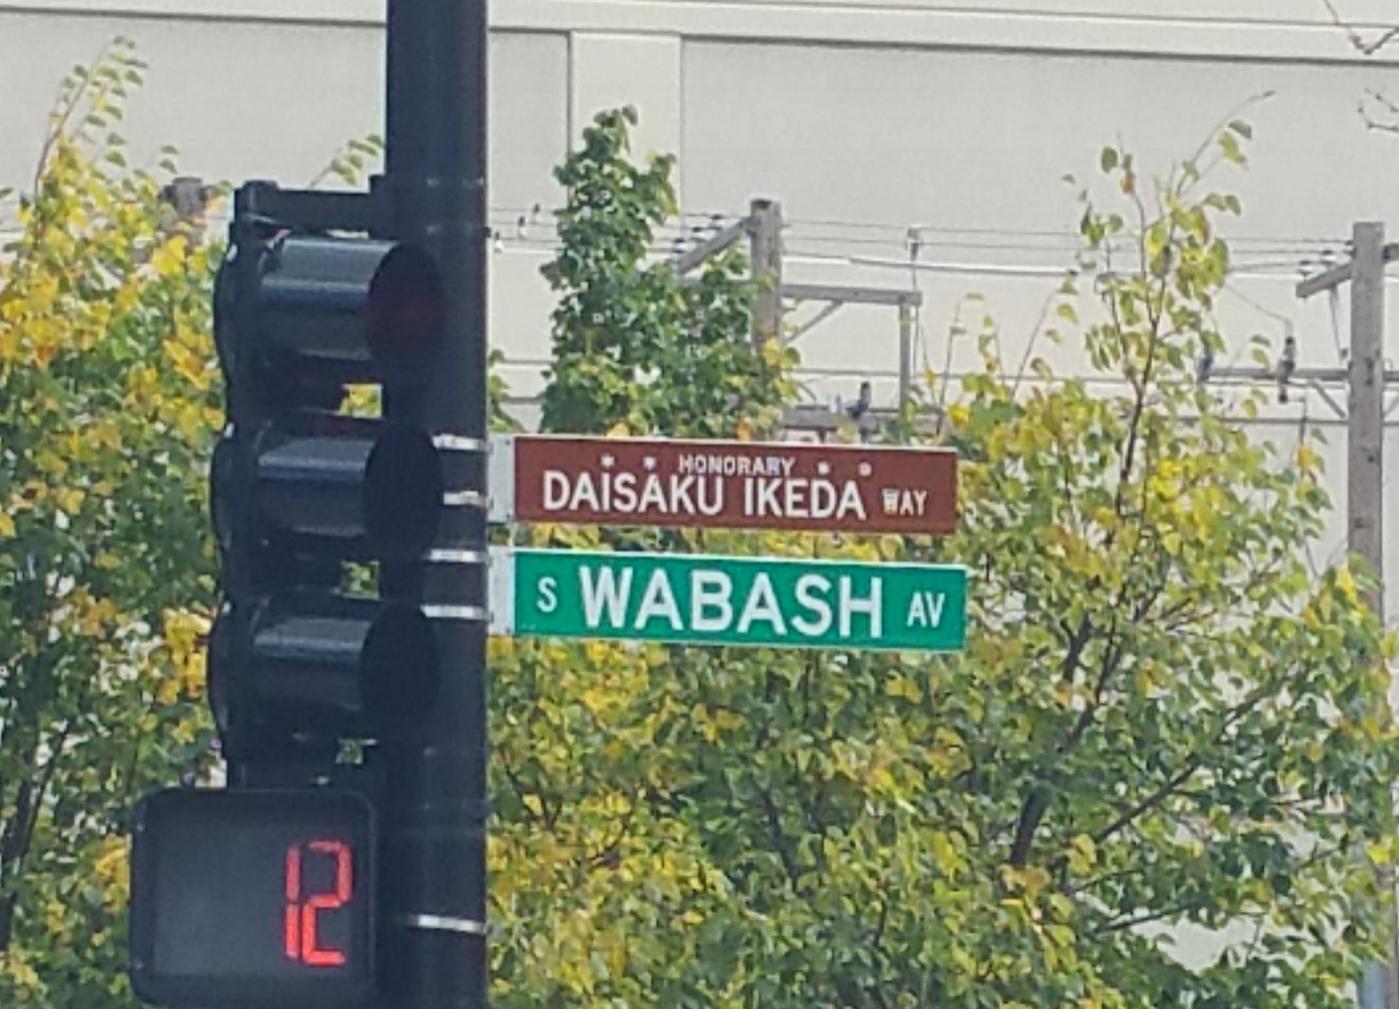 Daisku Ikeda Way - Buddhist philosopher, activist, SGI president - Honorary Chicago street signs